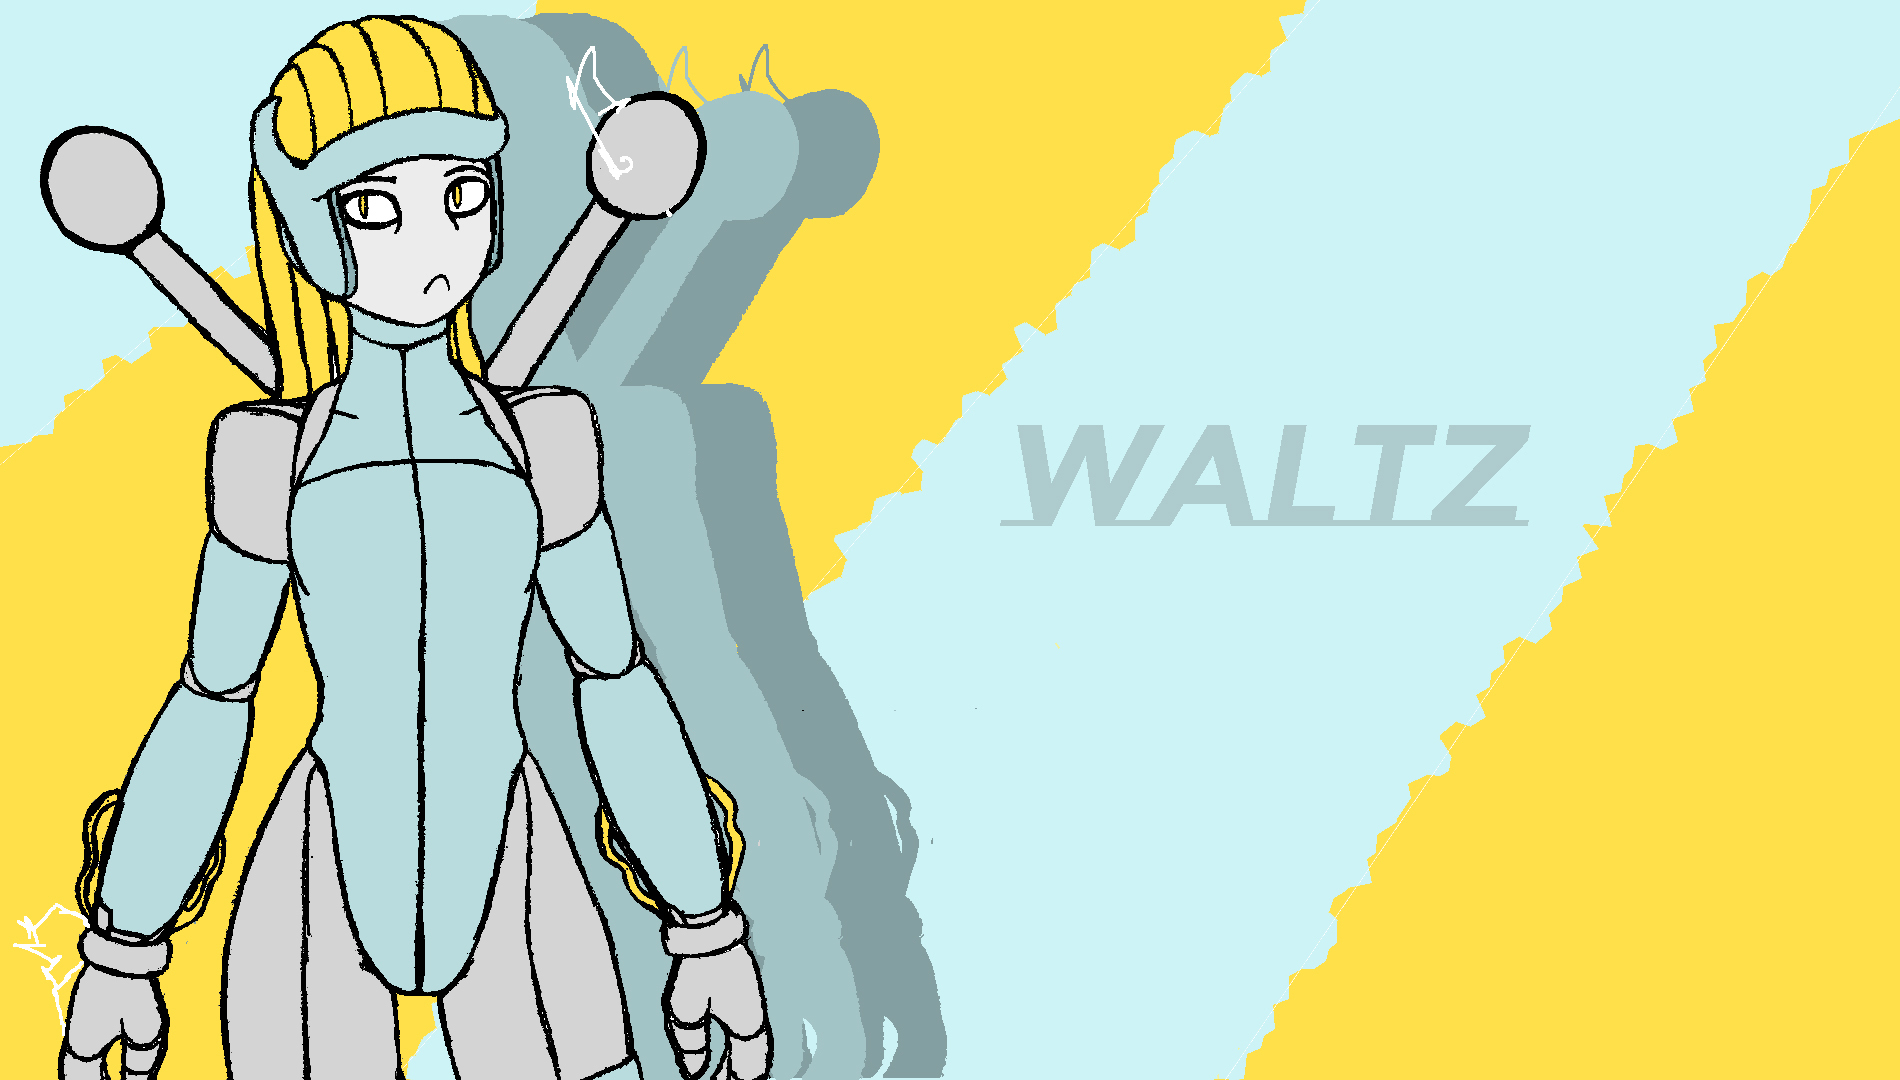 Megaman Inspired OC - Waltz